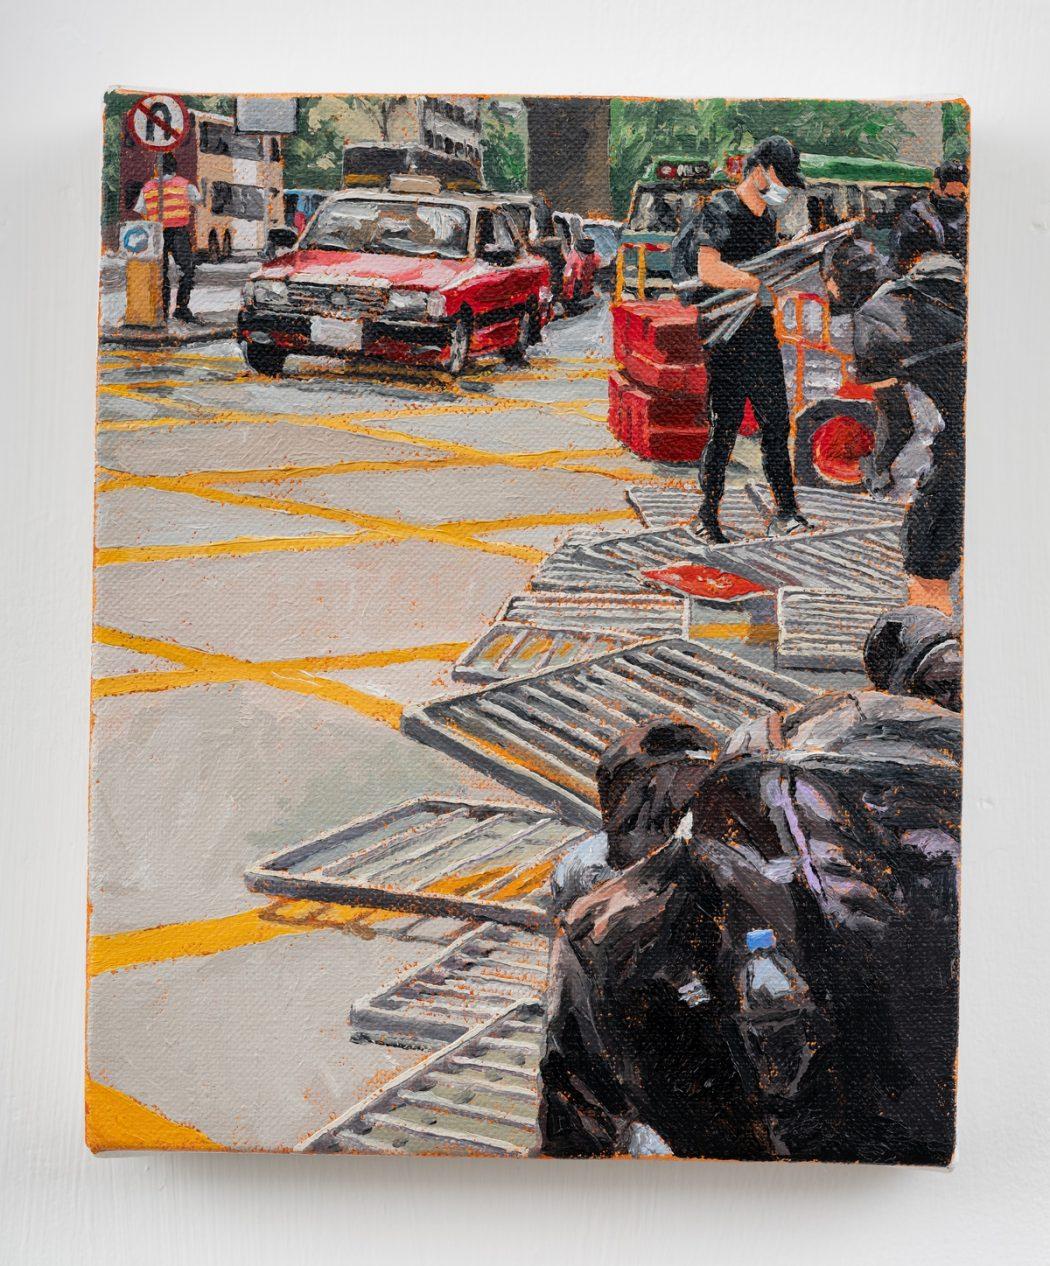 HKFP Lens Chow Chun-fai road blockage